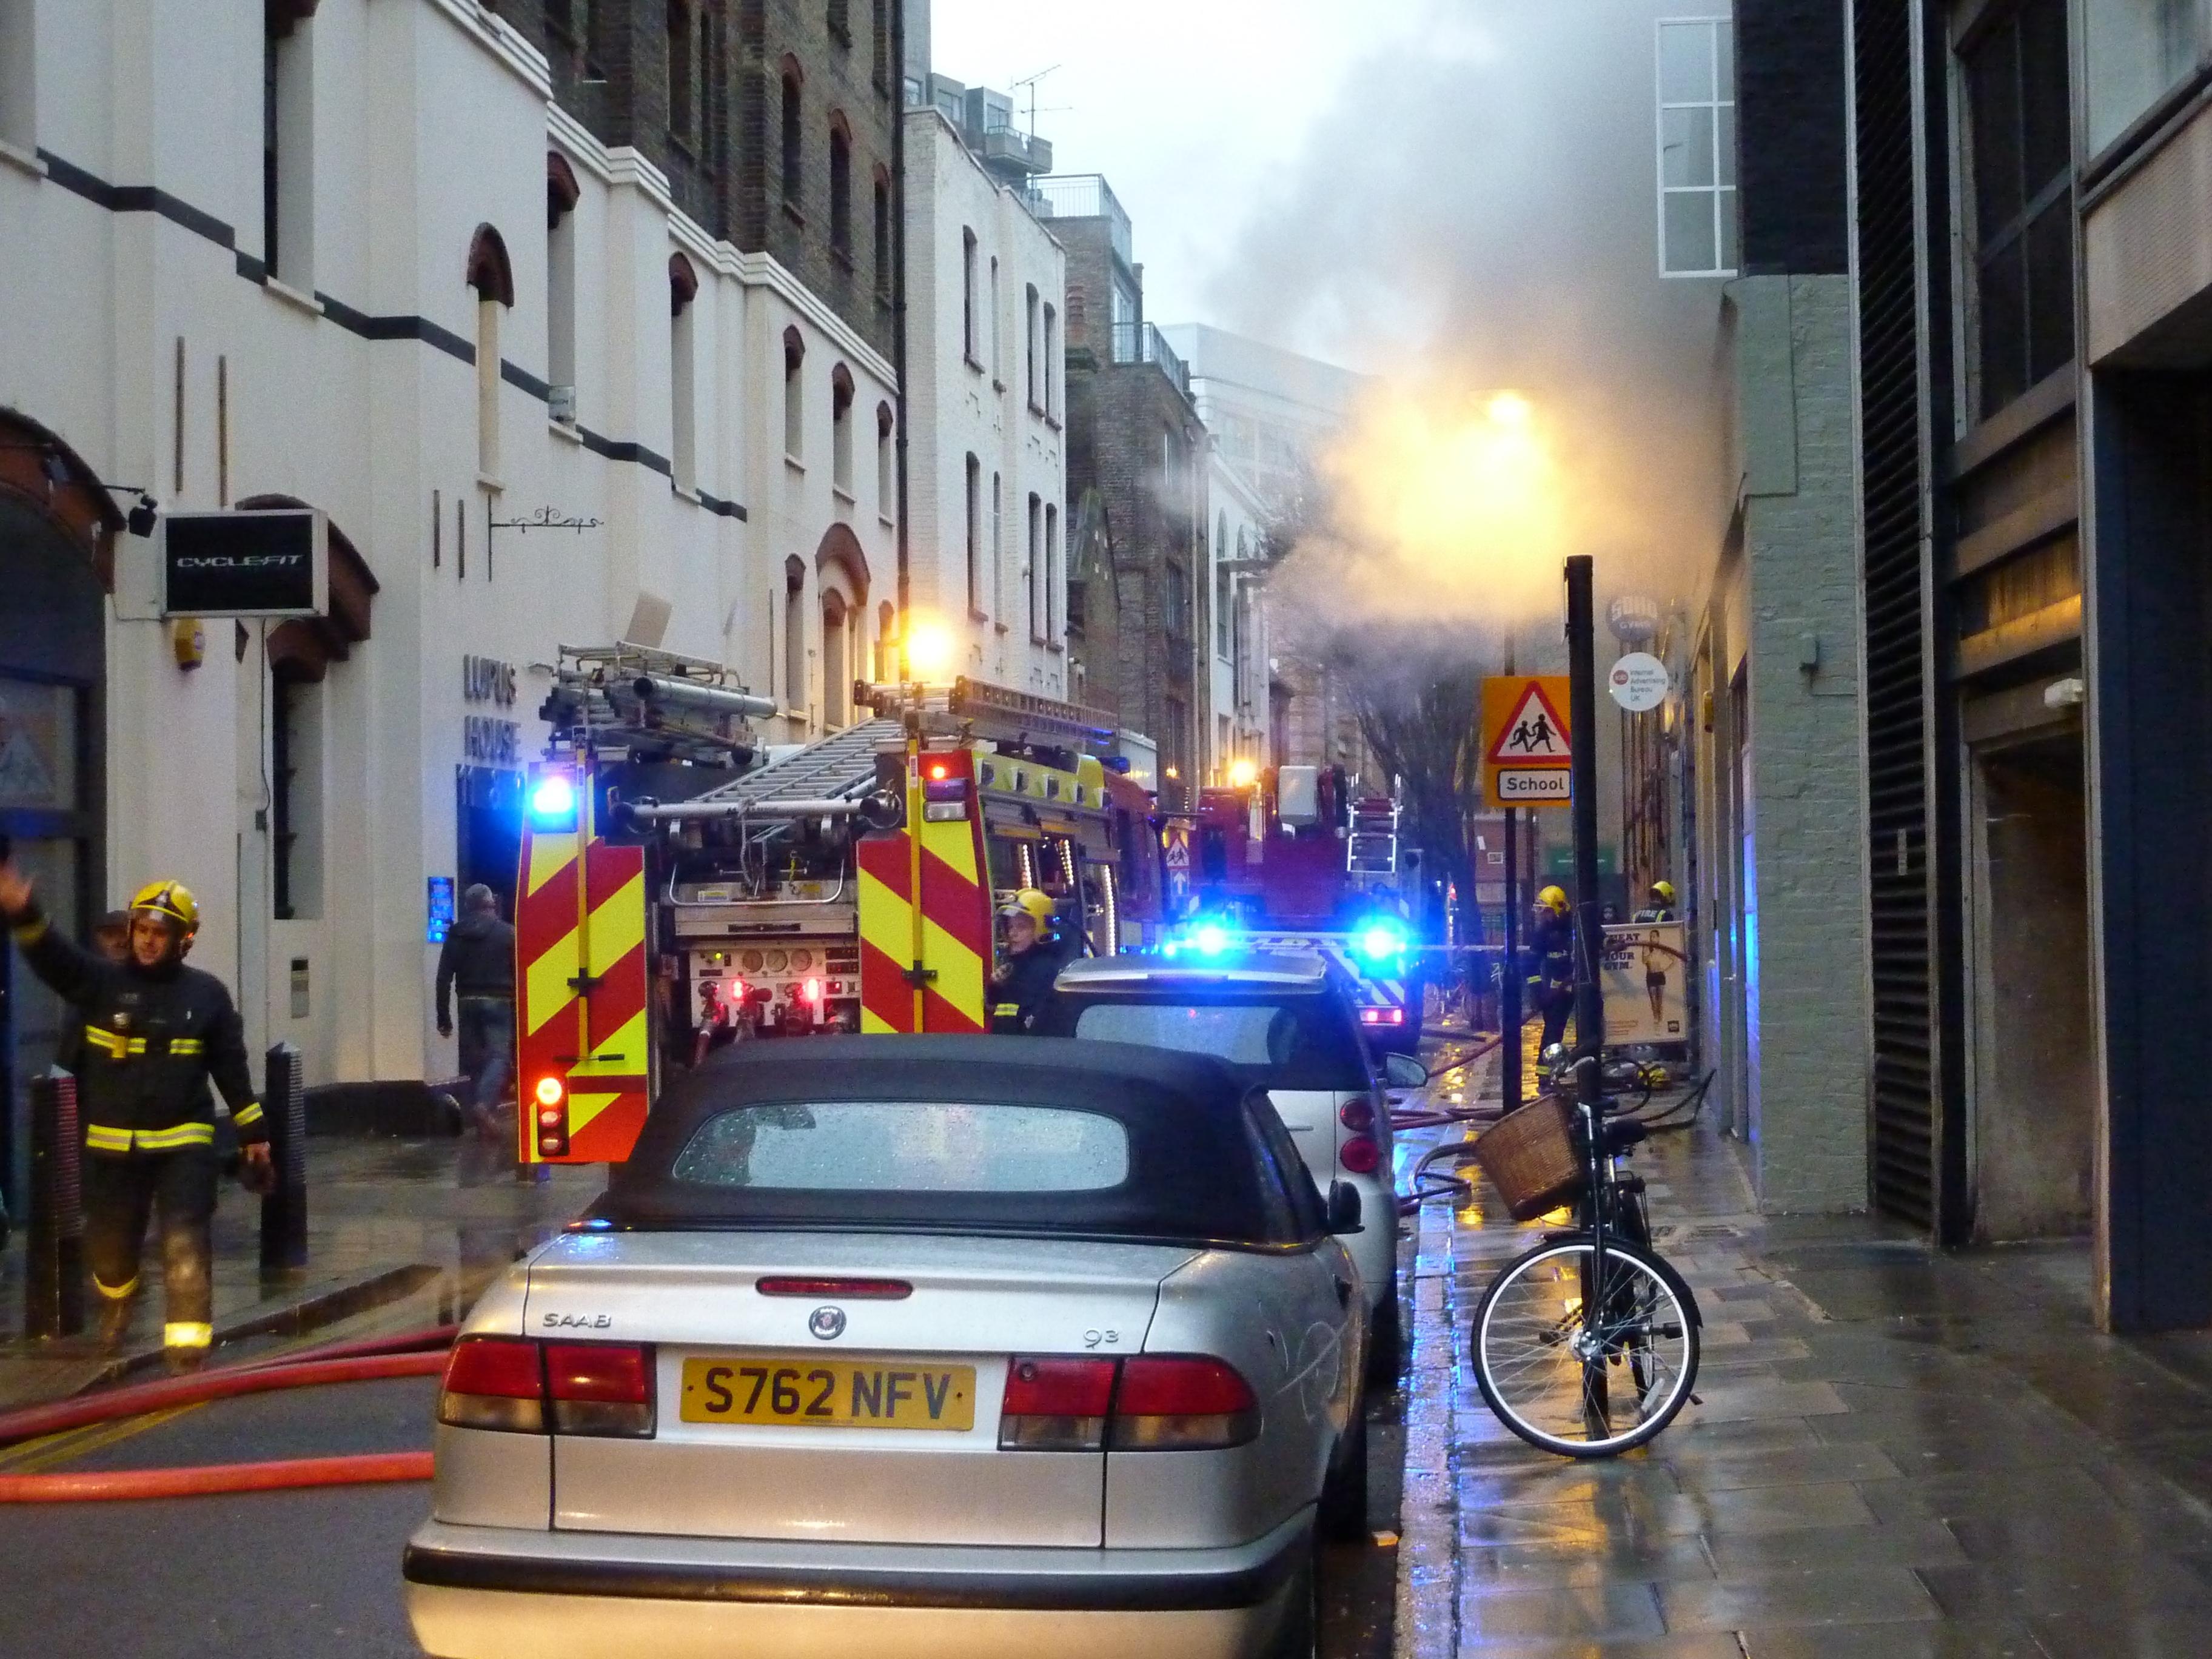 London Fire Brigade at work